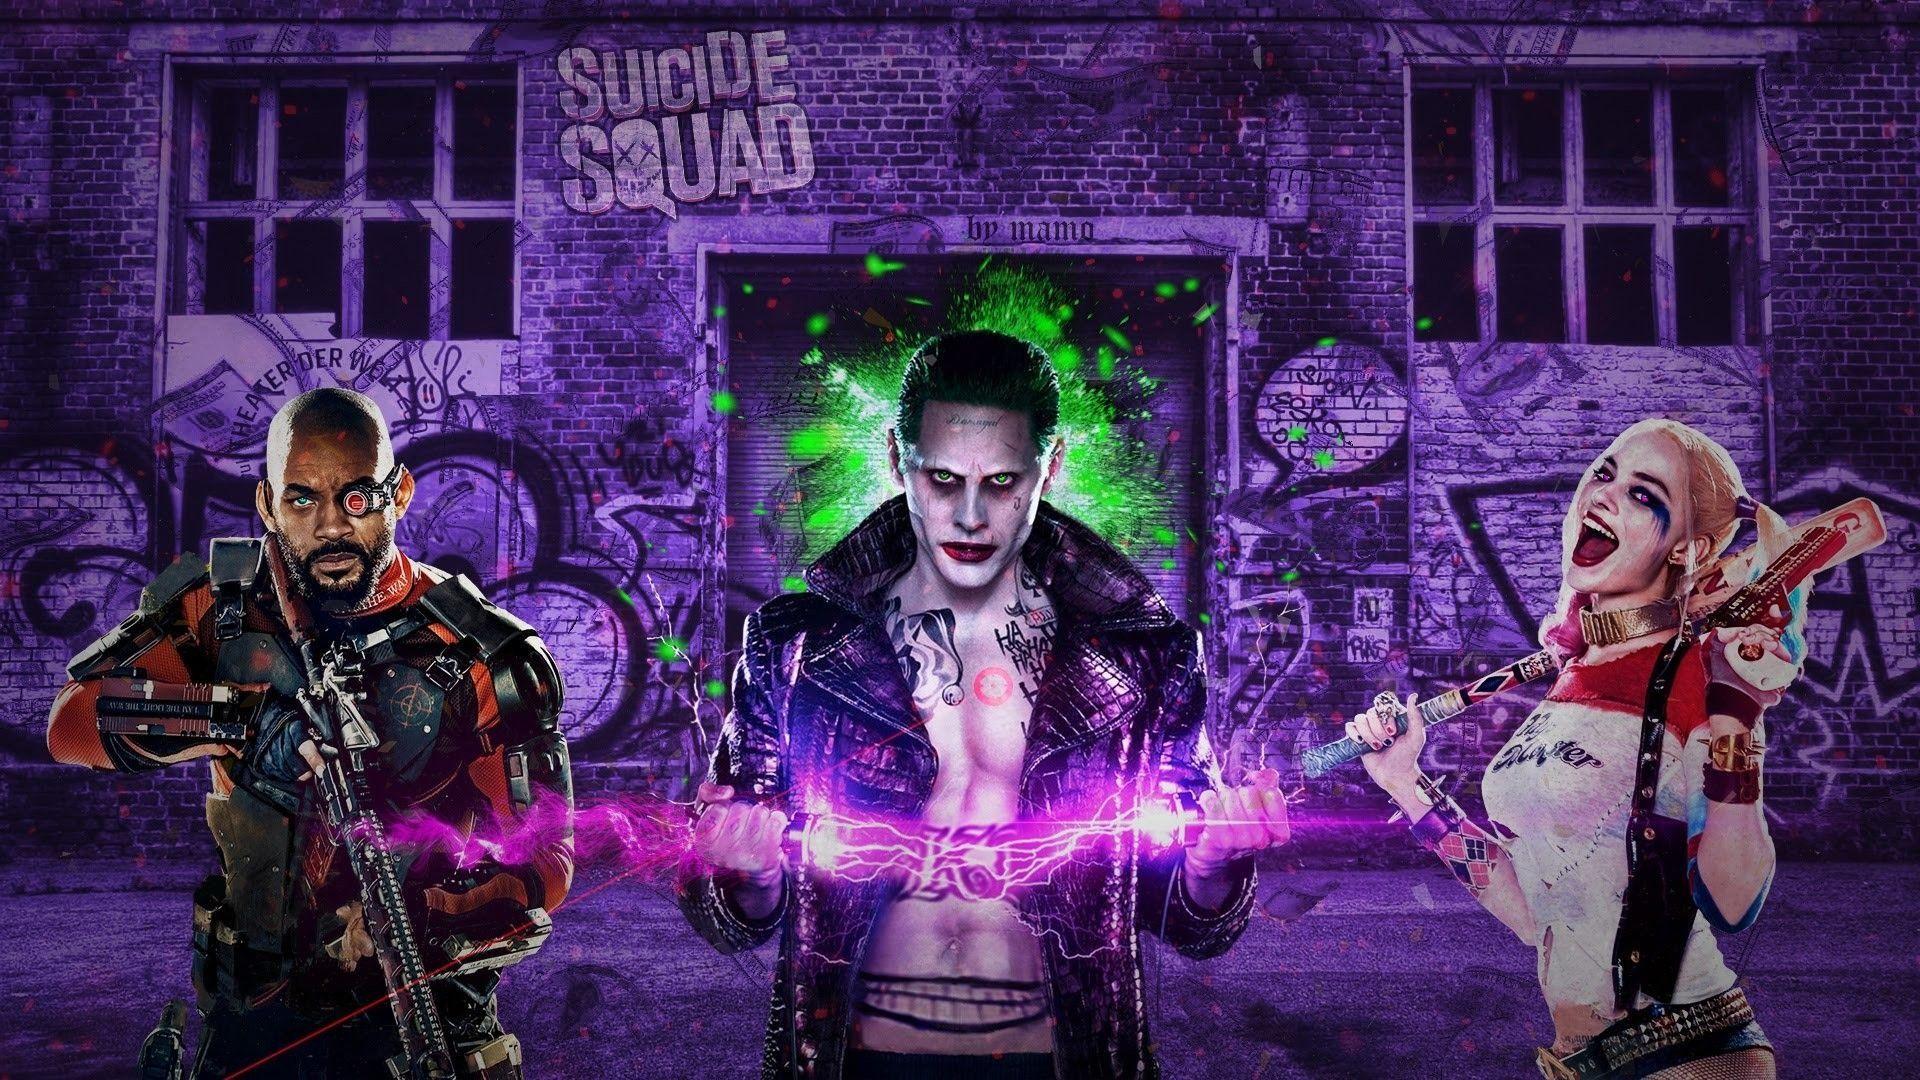 Suicide Squad Joker, Cool Wallpaper